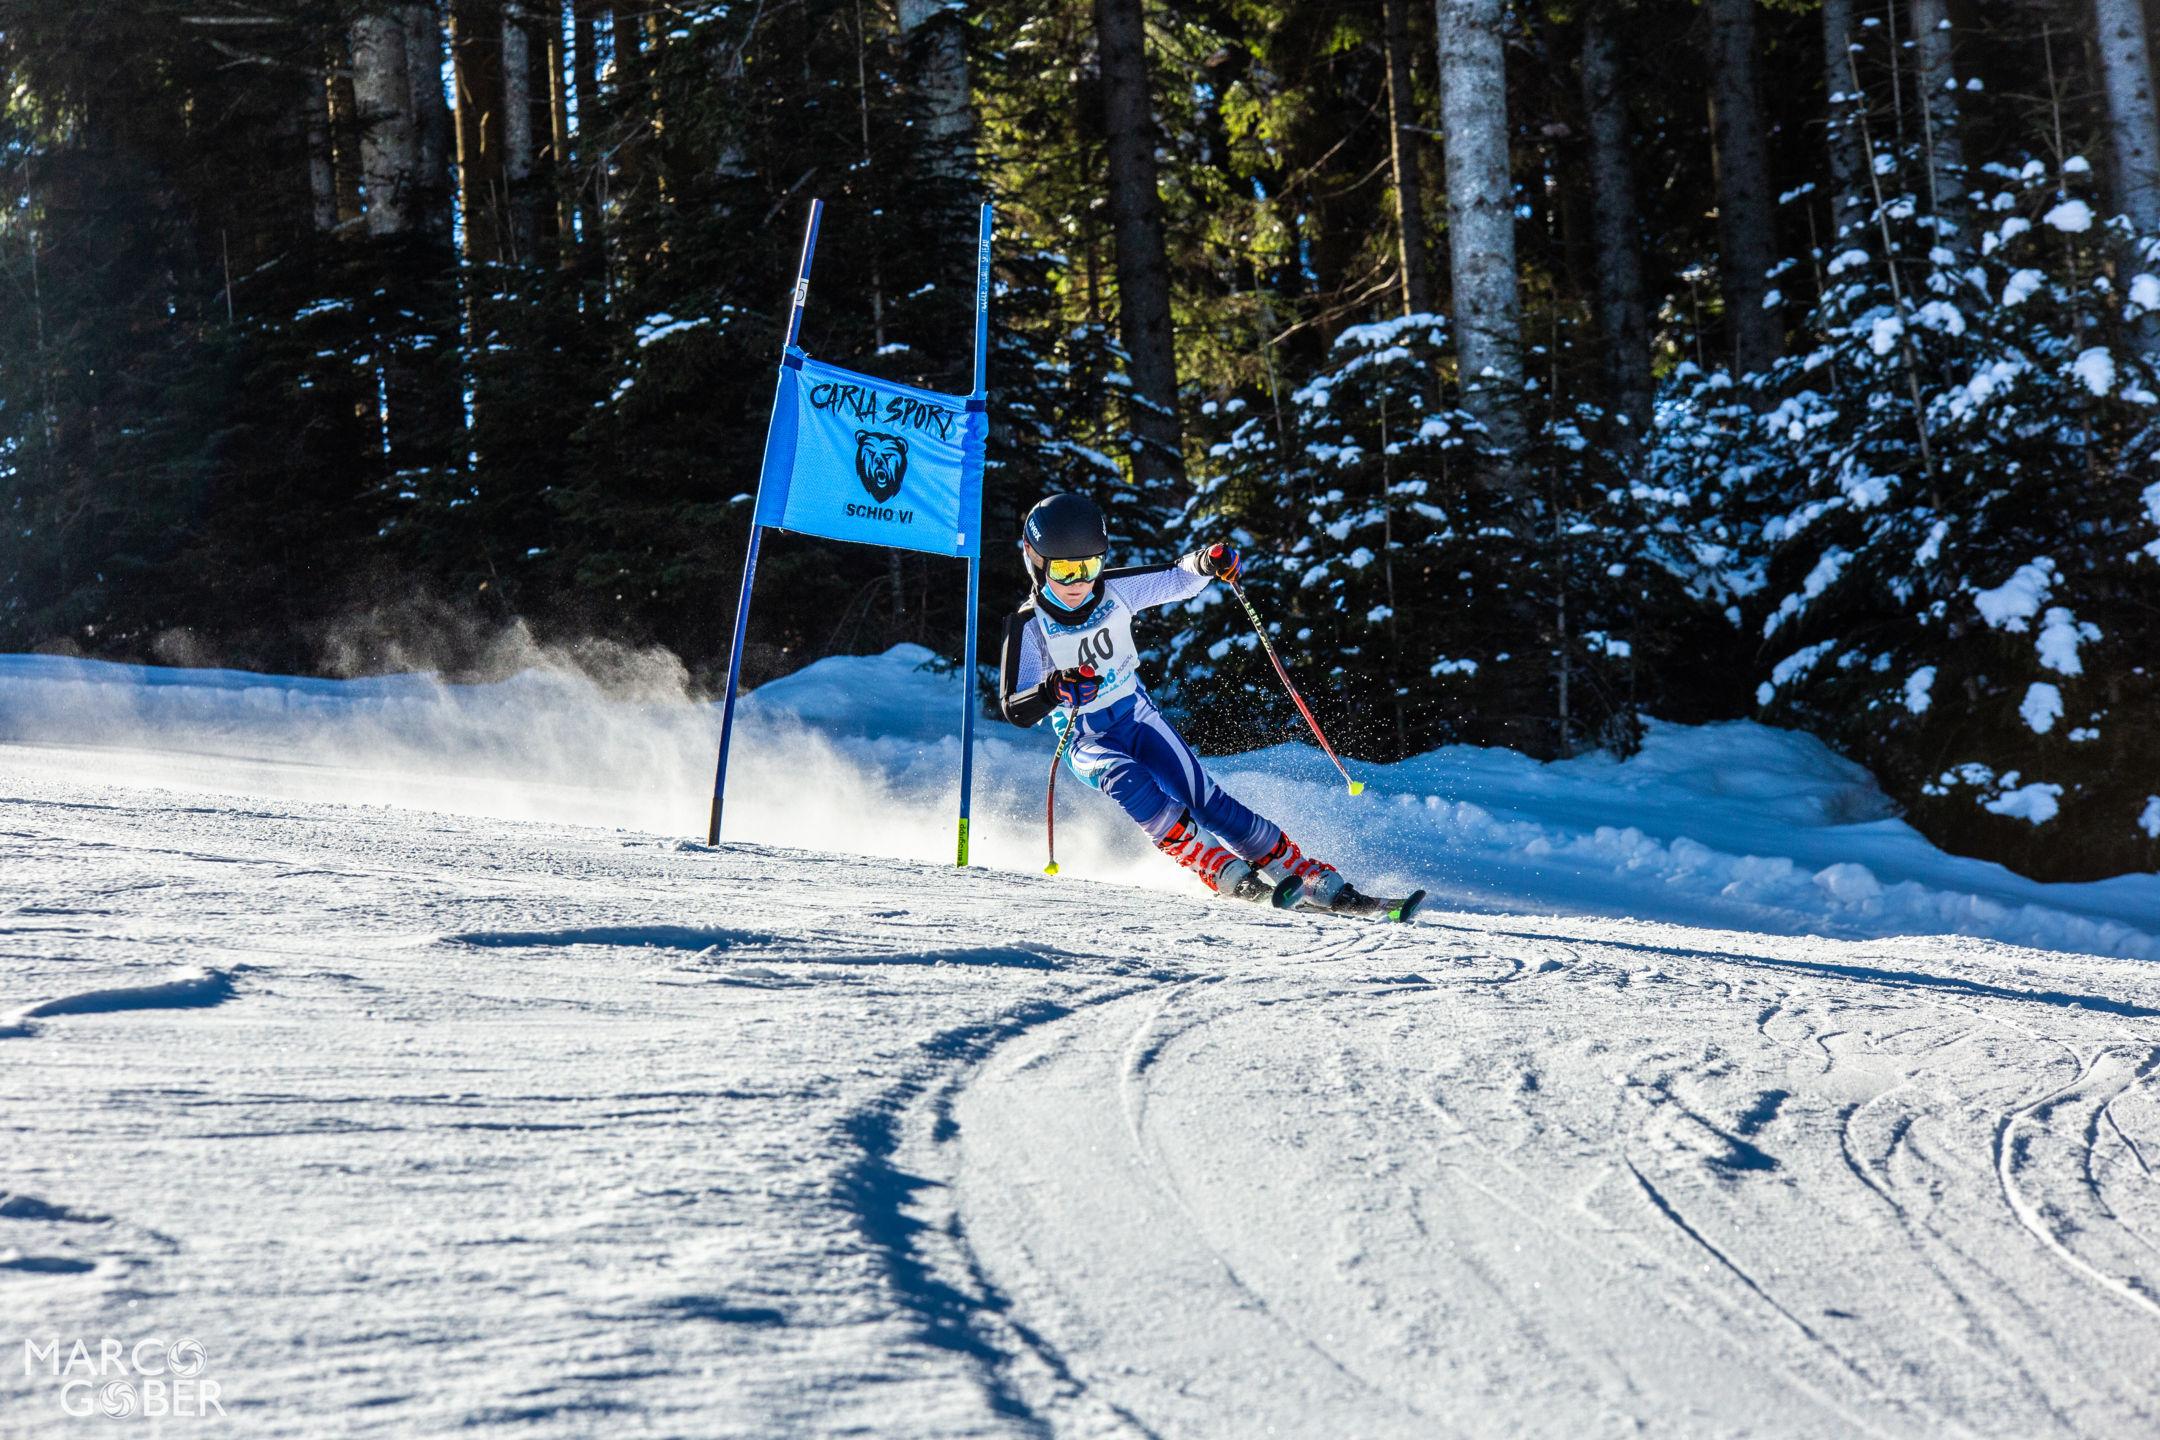 Piccole Dolomiti Ski Team